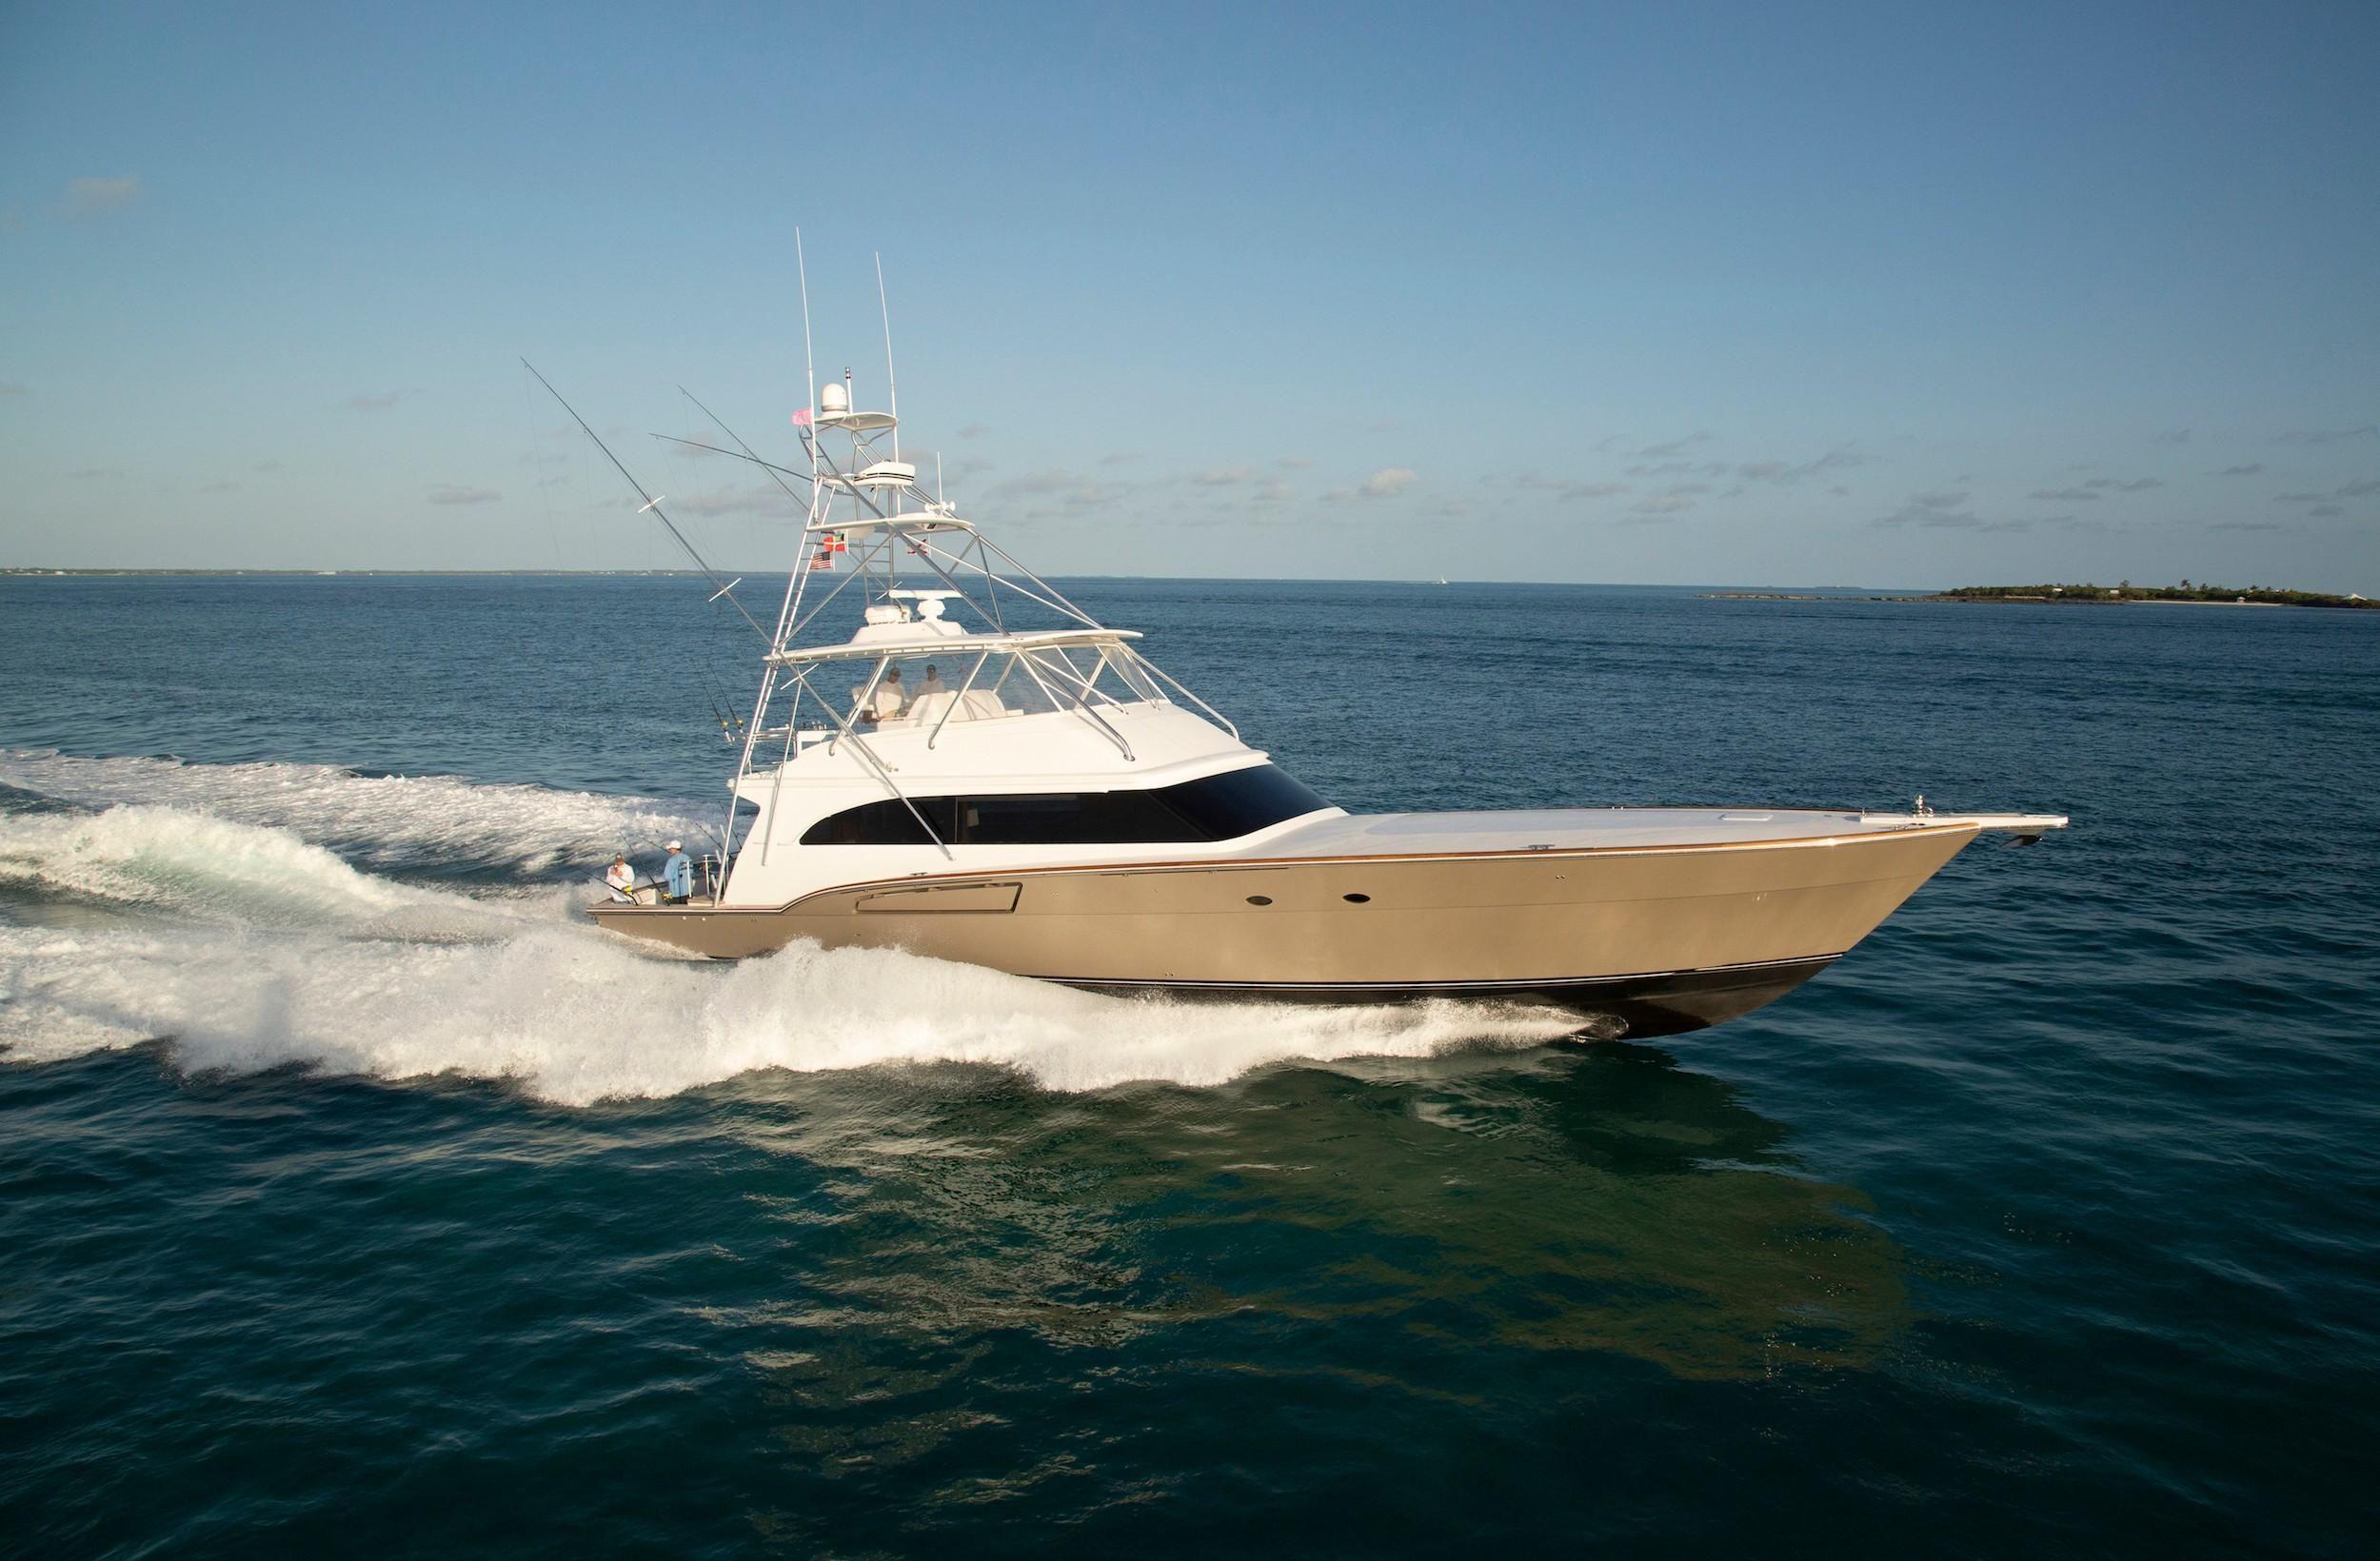 2010 Donzi Convertible Sportfish Power Boat For Sale Www Garbage Disposal Plumbing Also Lg Slide In Range On Wiring